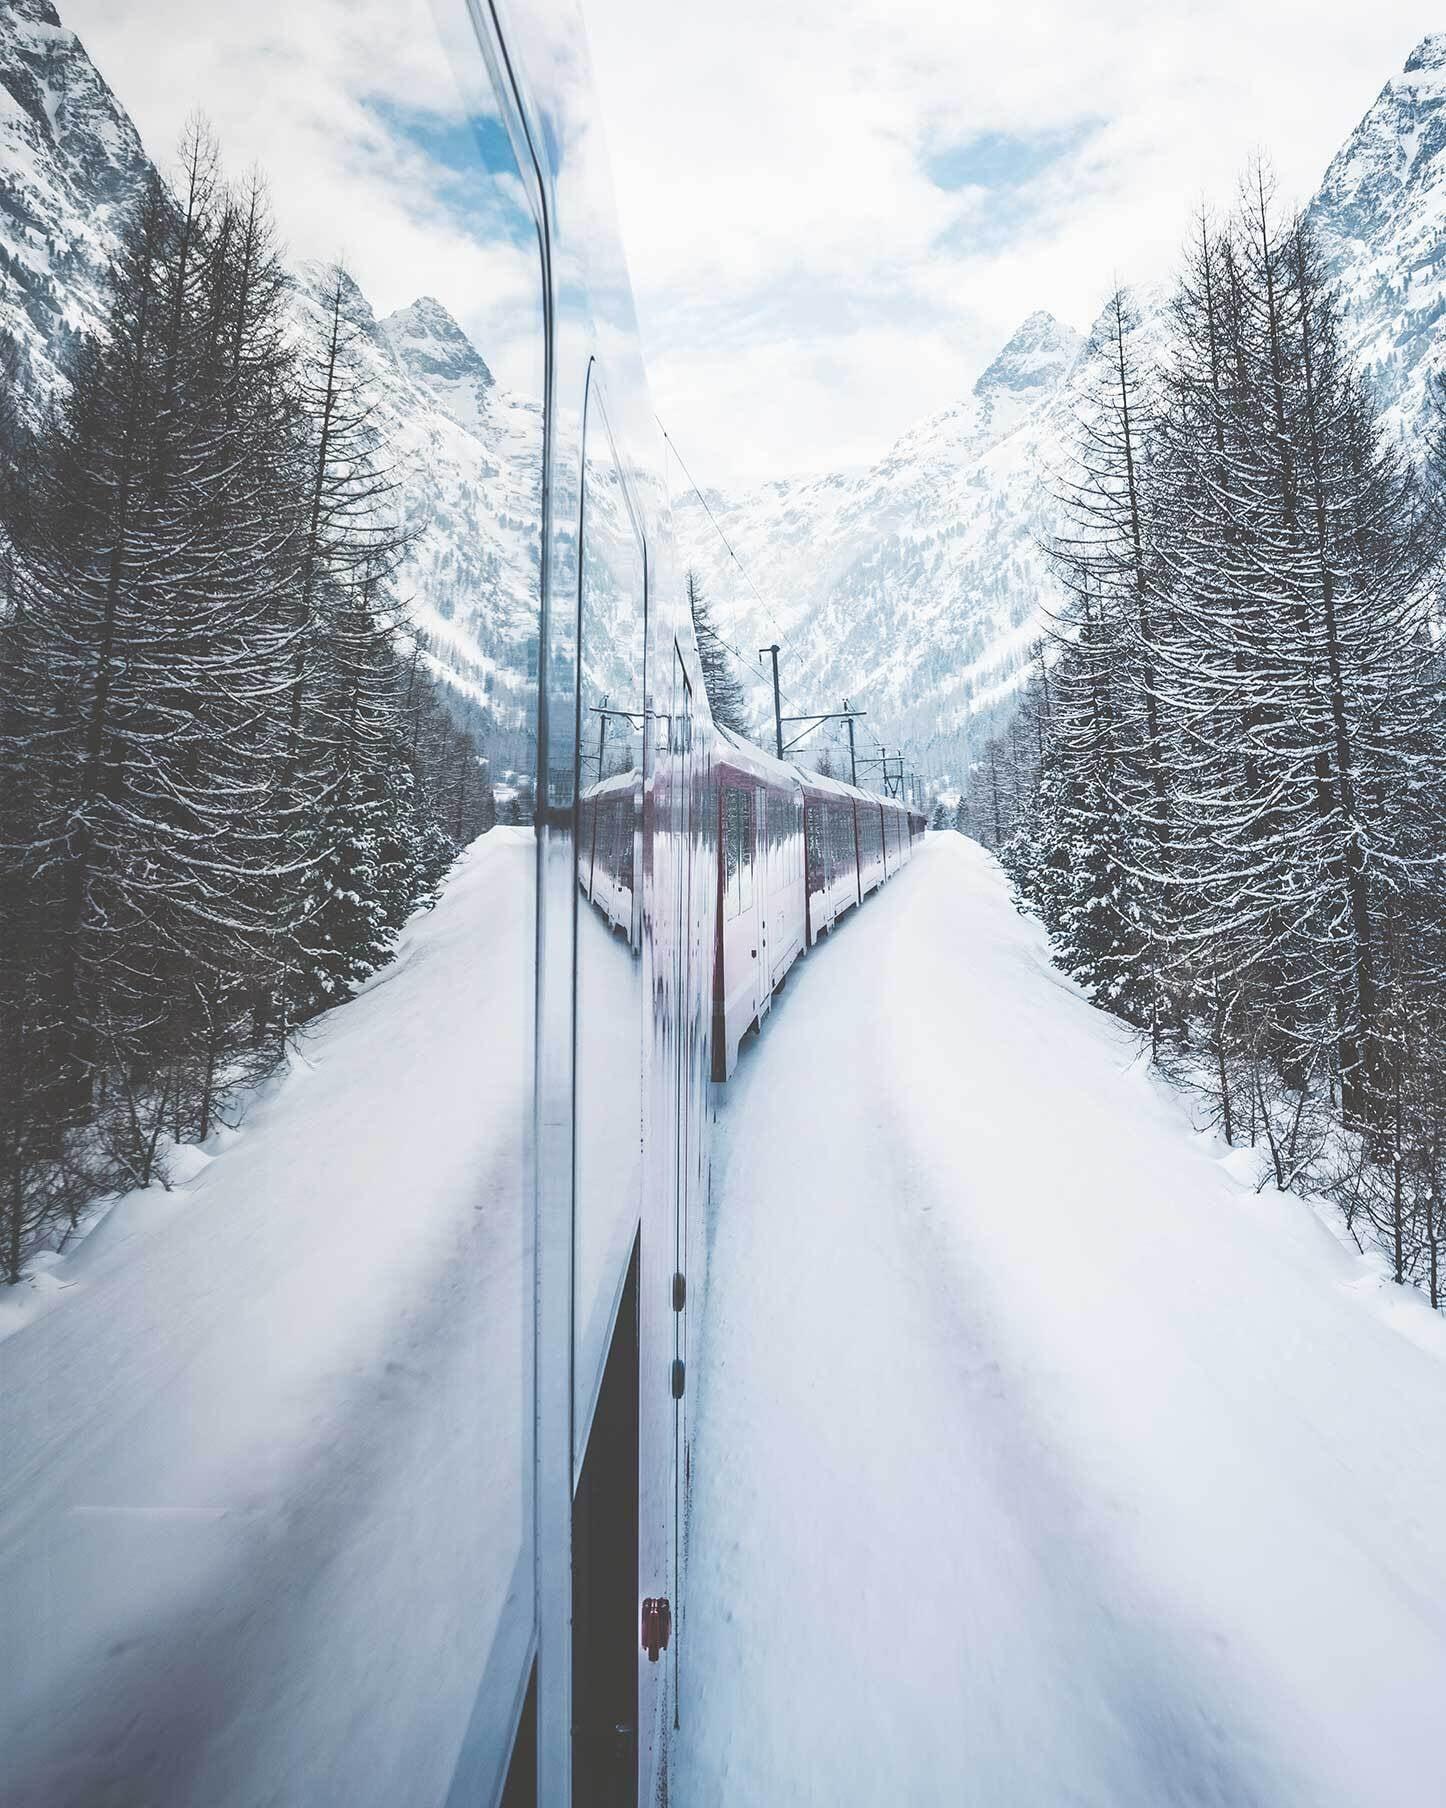 Glacier Express St. Moritz